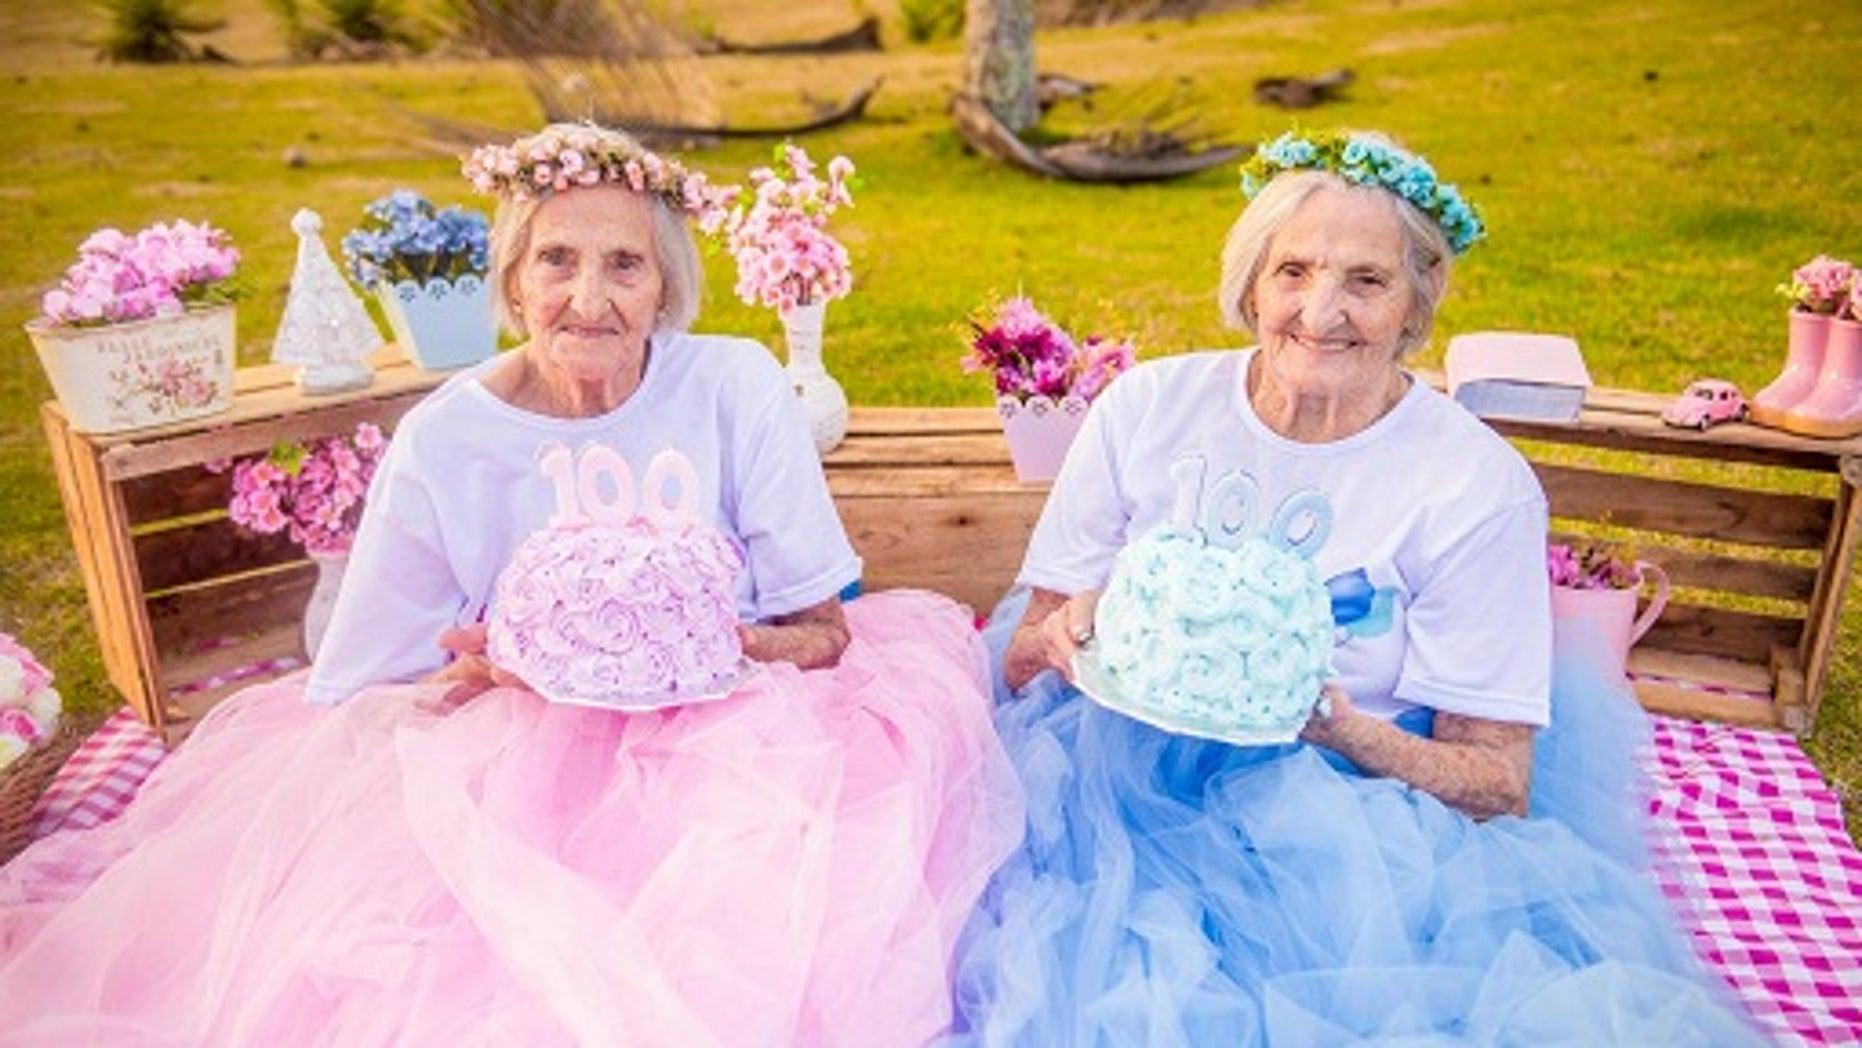 Twins Maria Pignaton Pontin and Paulina Pignaton Pandolfi will turn 100 years on May 20, 2017. The twins commemorated their milestone birthday with a photoshoot.